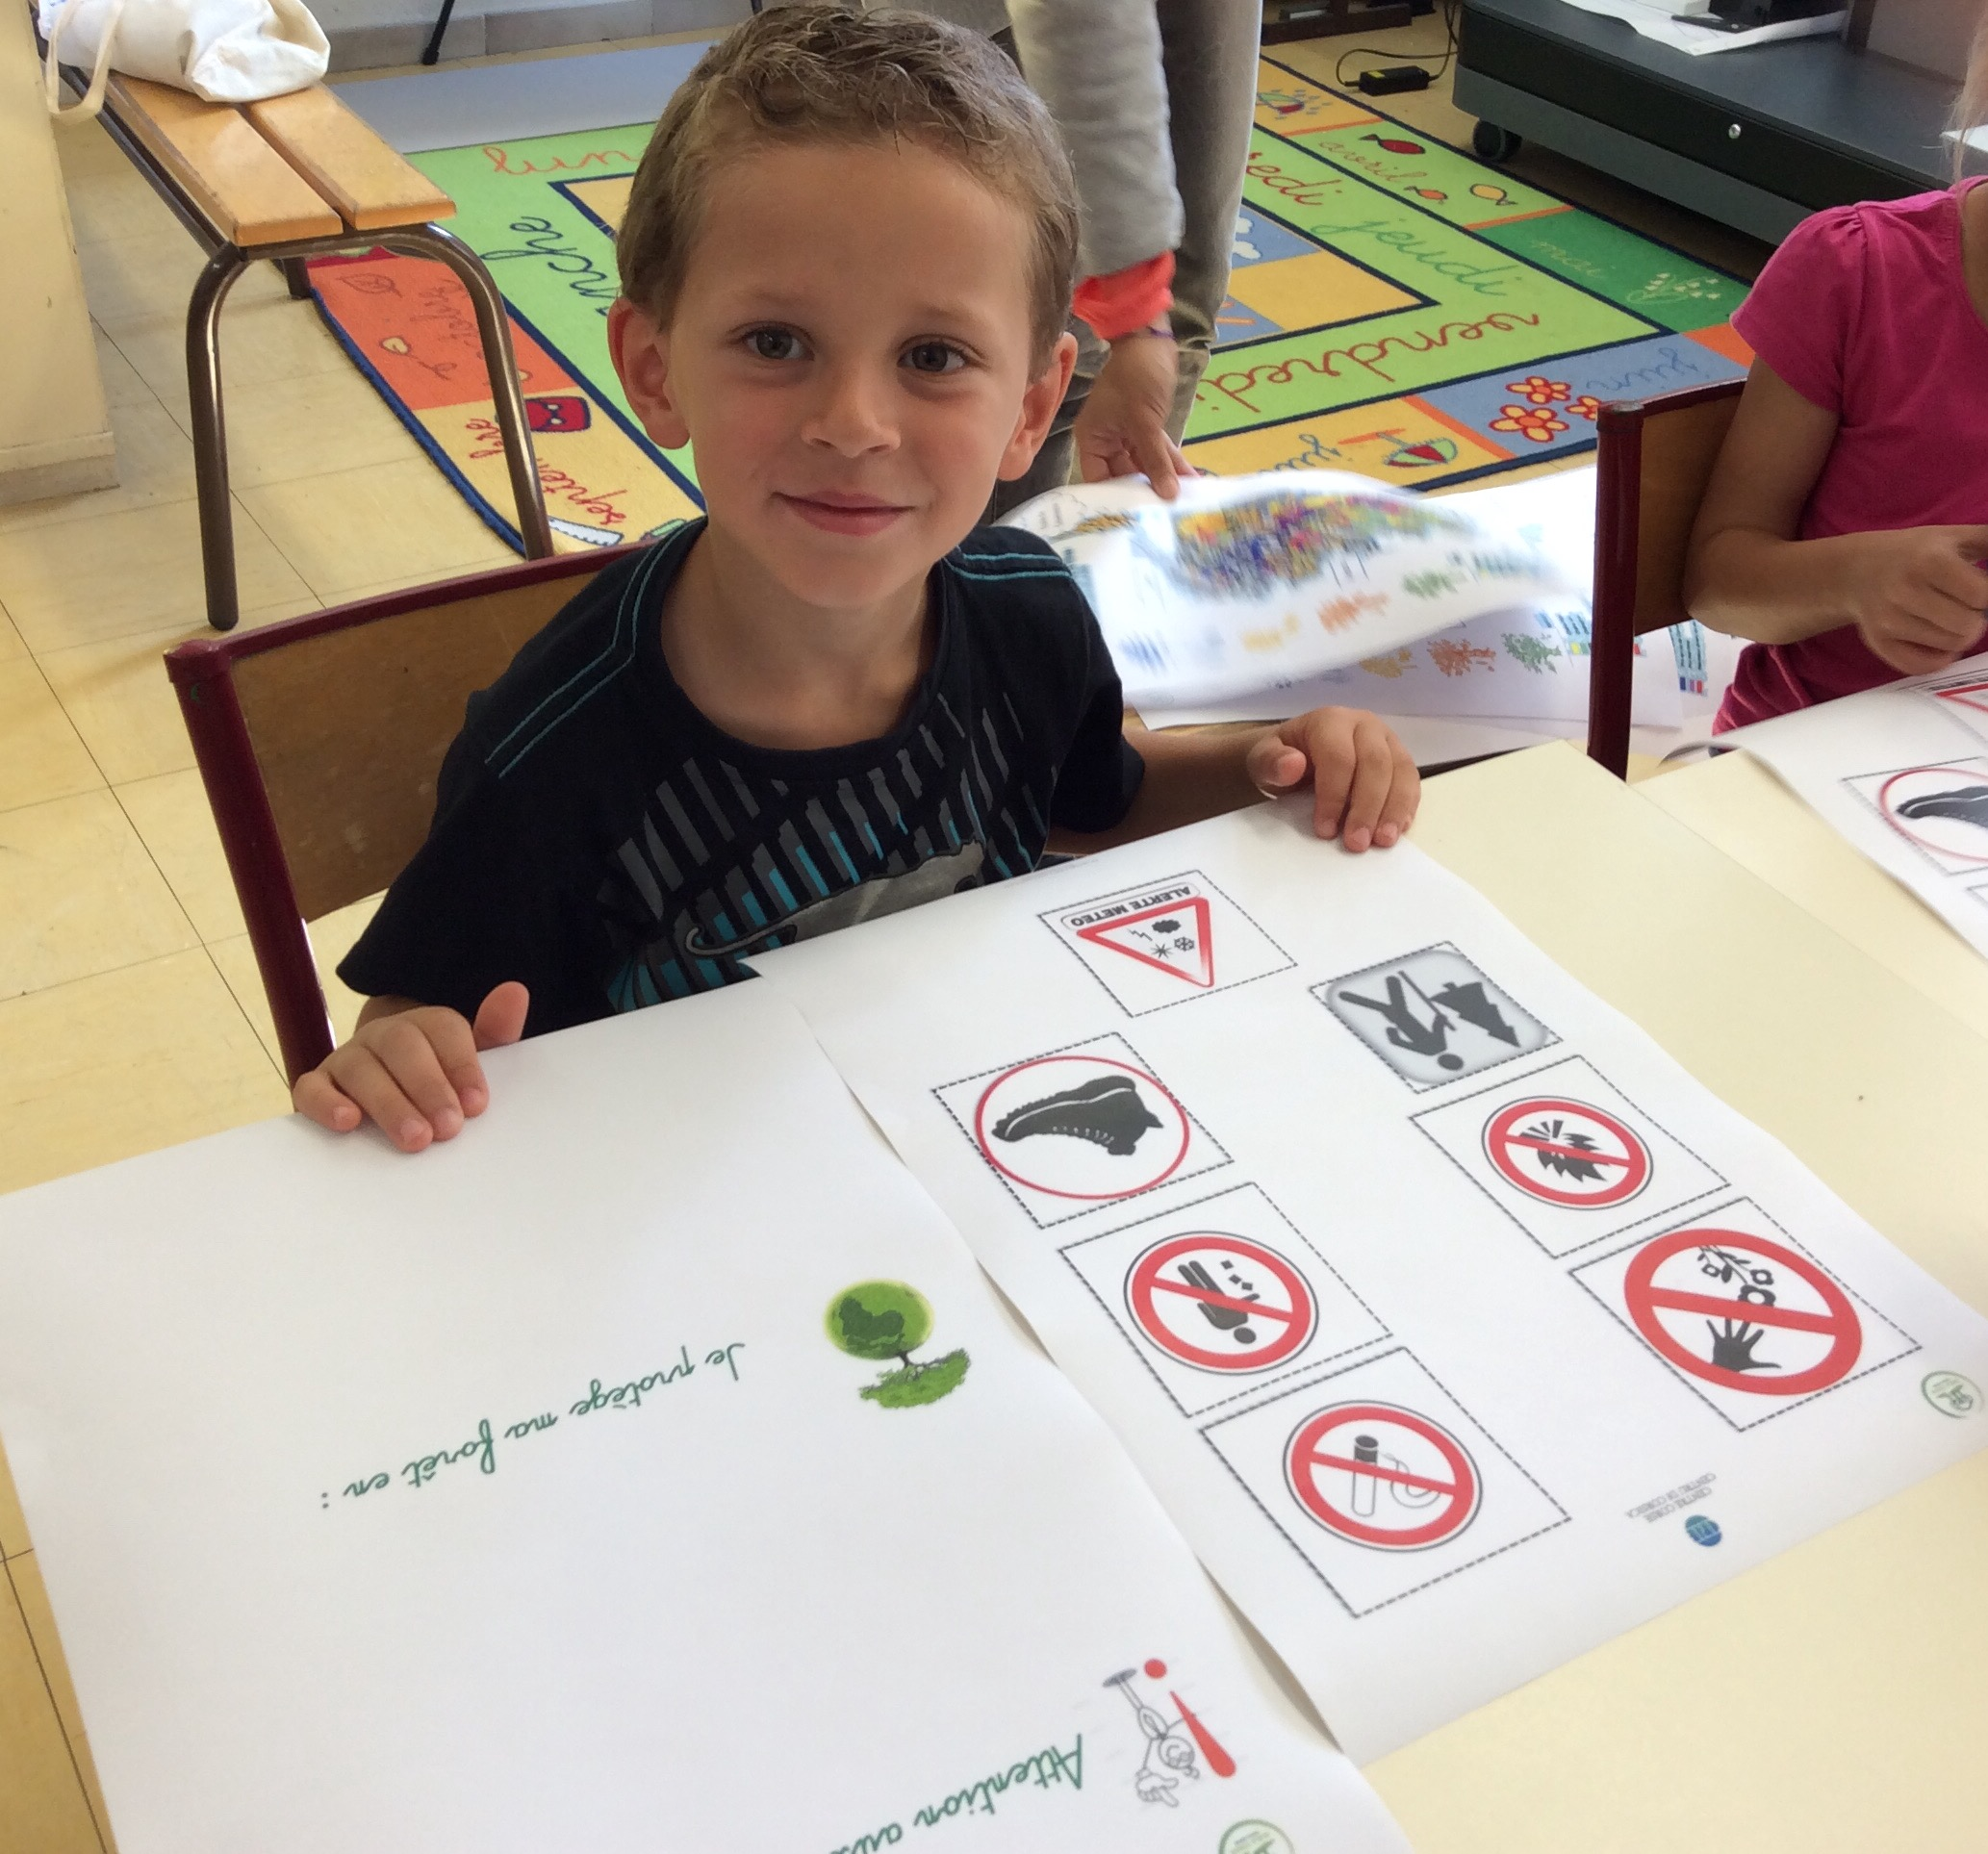 Lucciana : La forêt s'invite à l'école de Casamozza